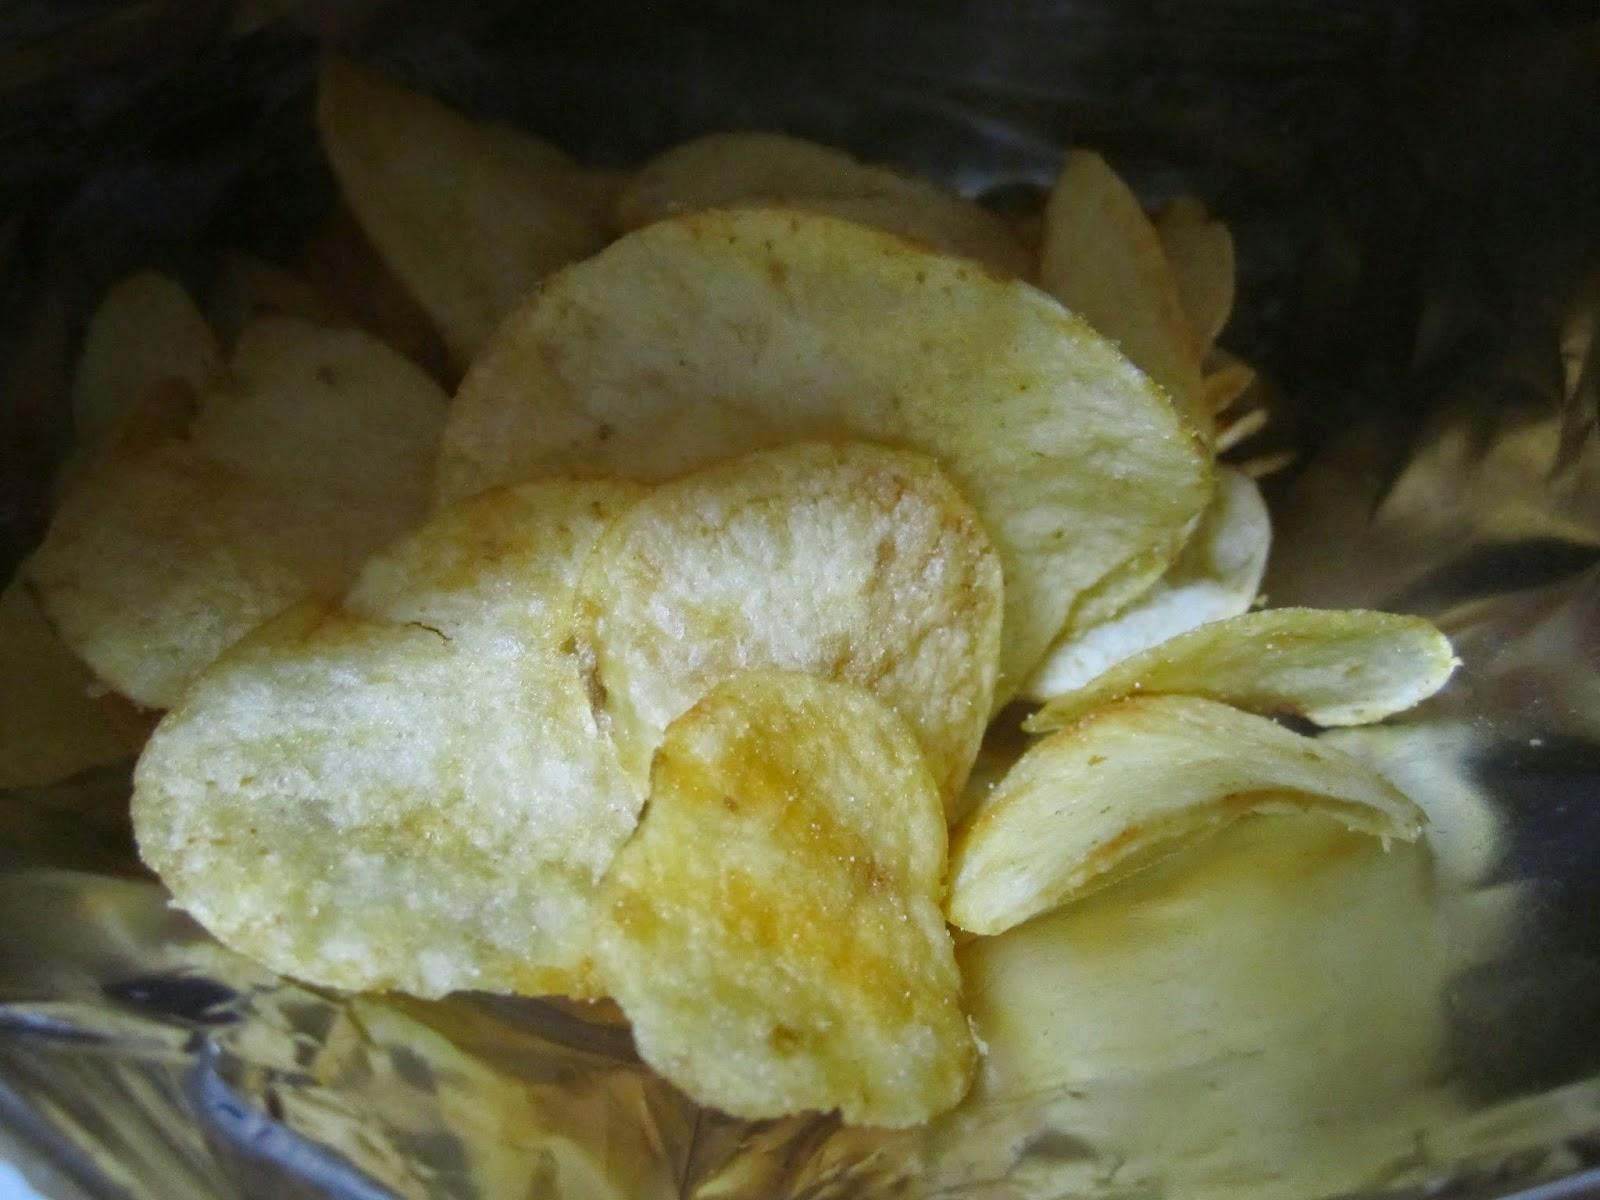 Stamina Gen Tare Potato Chips Calbee KNK スタミナ源たれ味ポテトチップス カルビー 上北農産加工農業協同組合